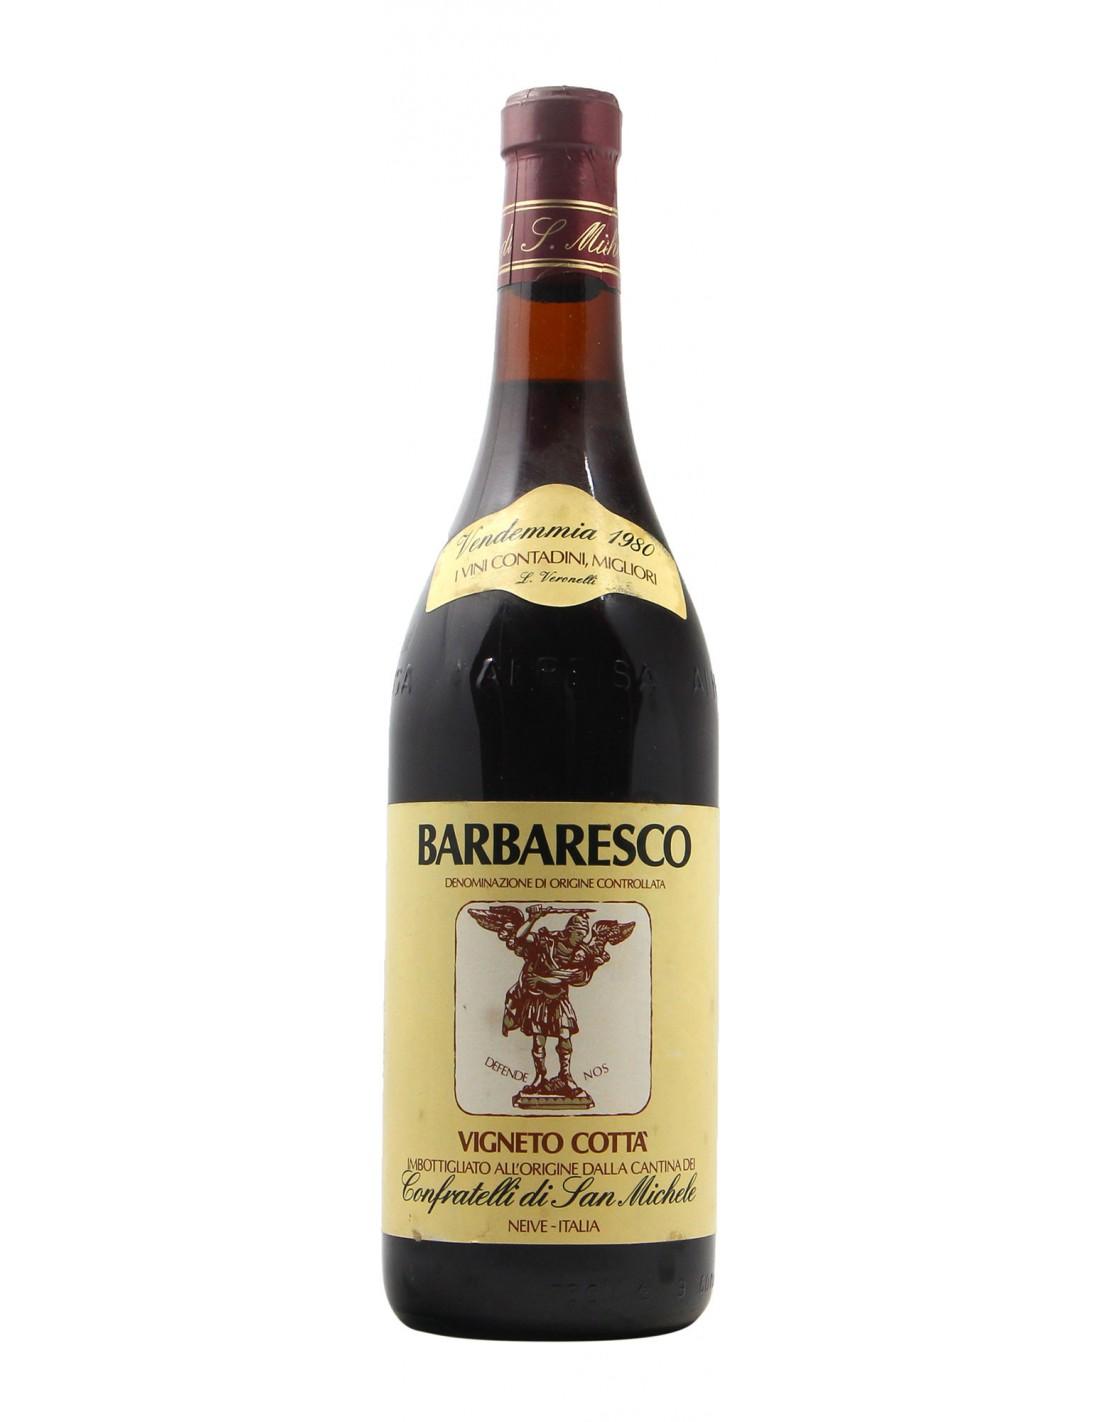 BARBARESCO VIGNETO COTTA' 1980 CONFRATELLI DI SAN MICHELE Grandi Bottiglie